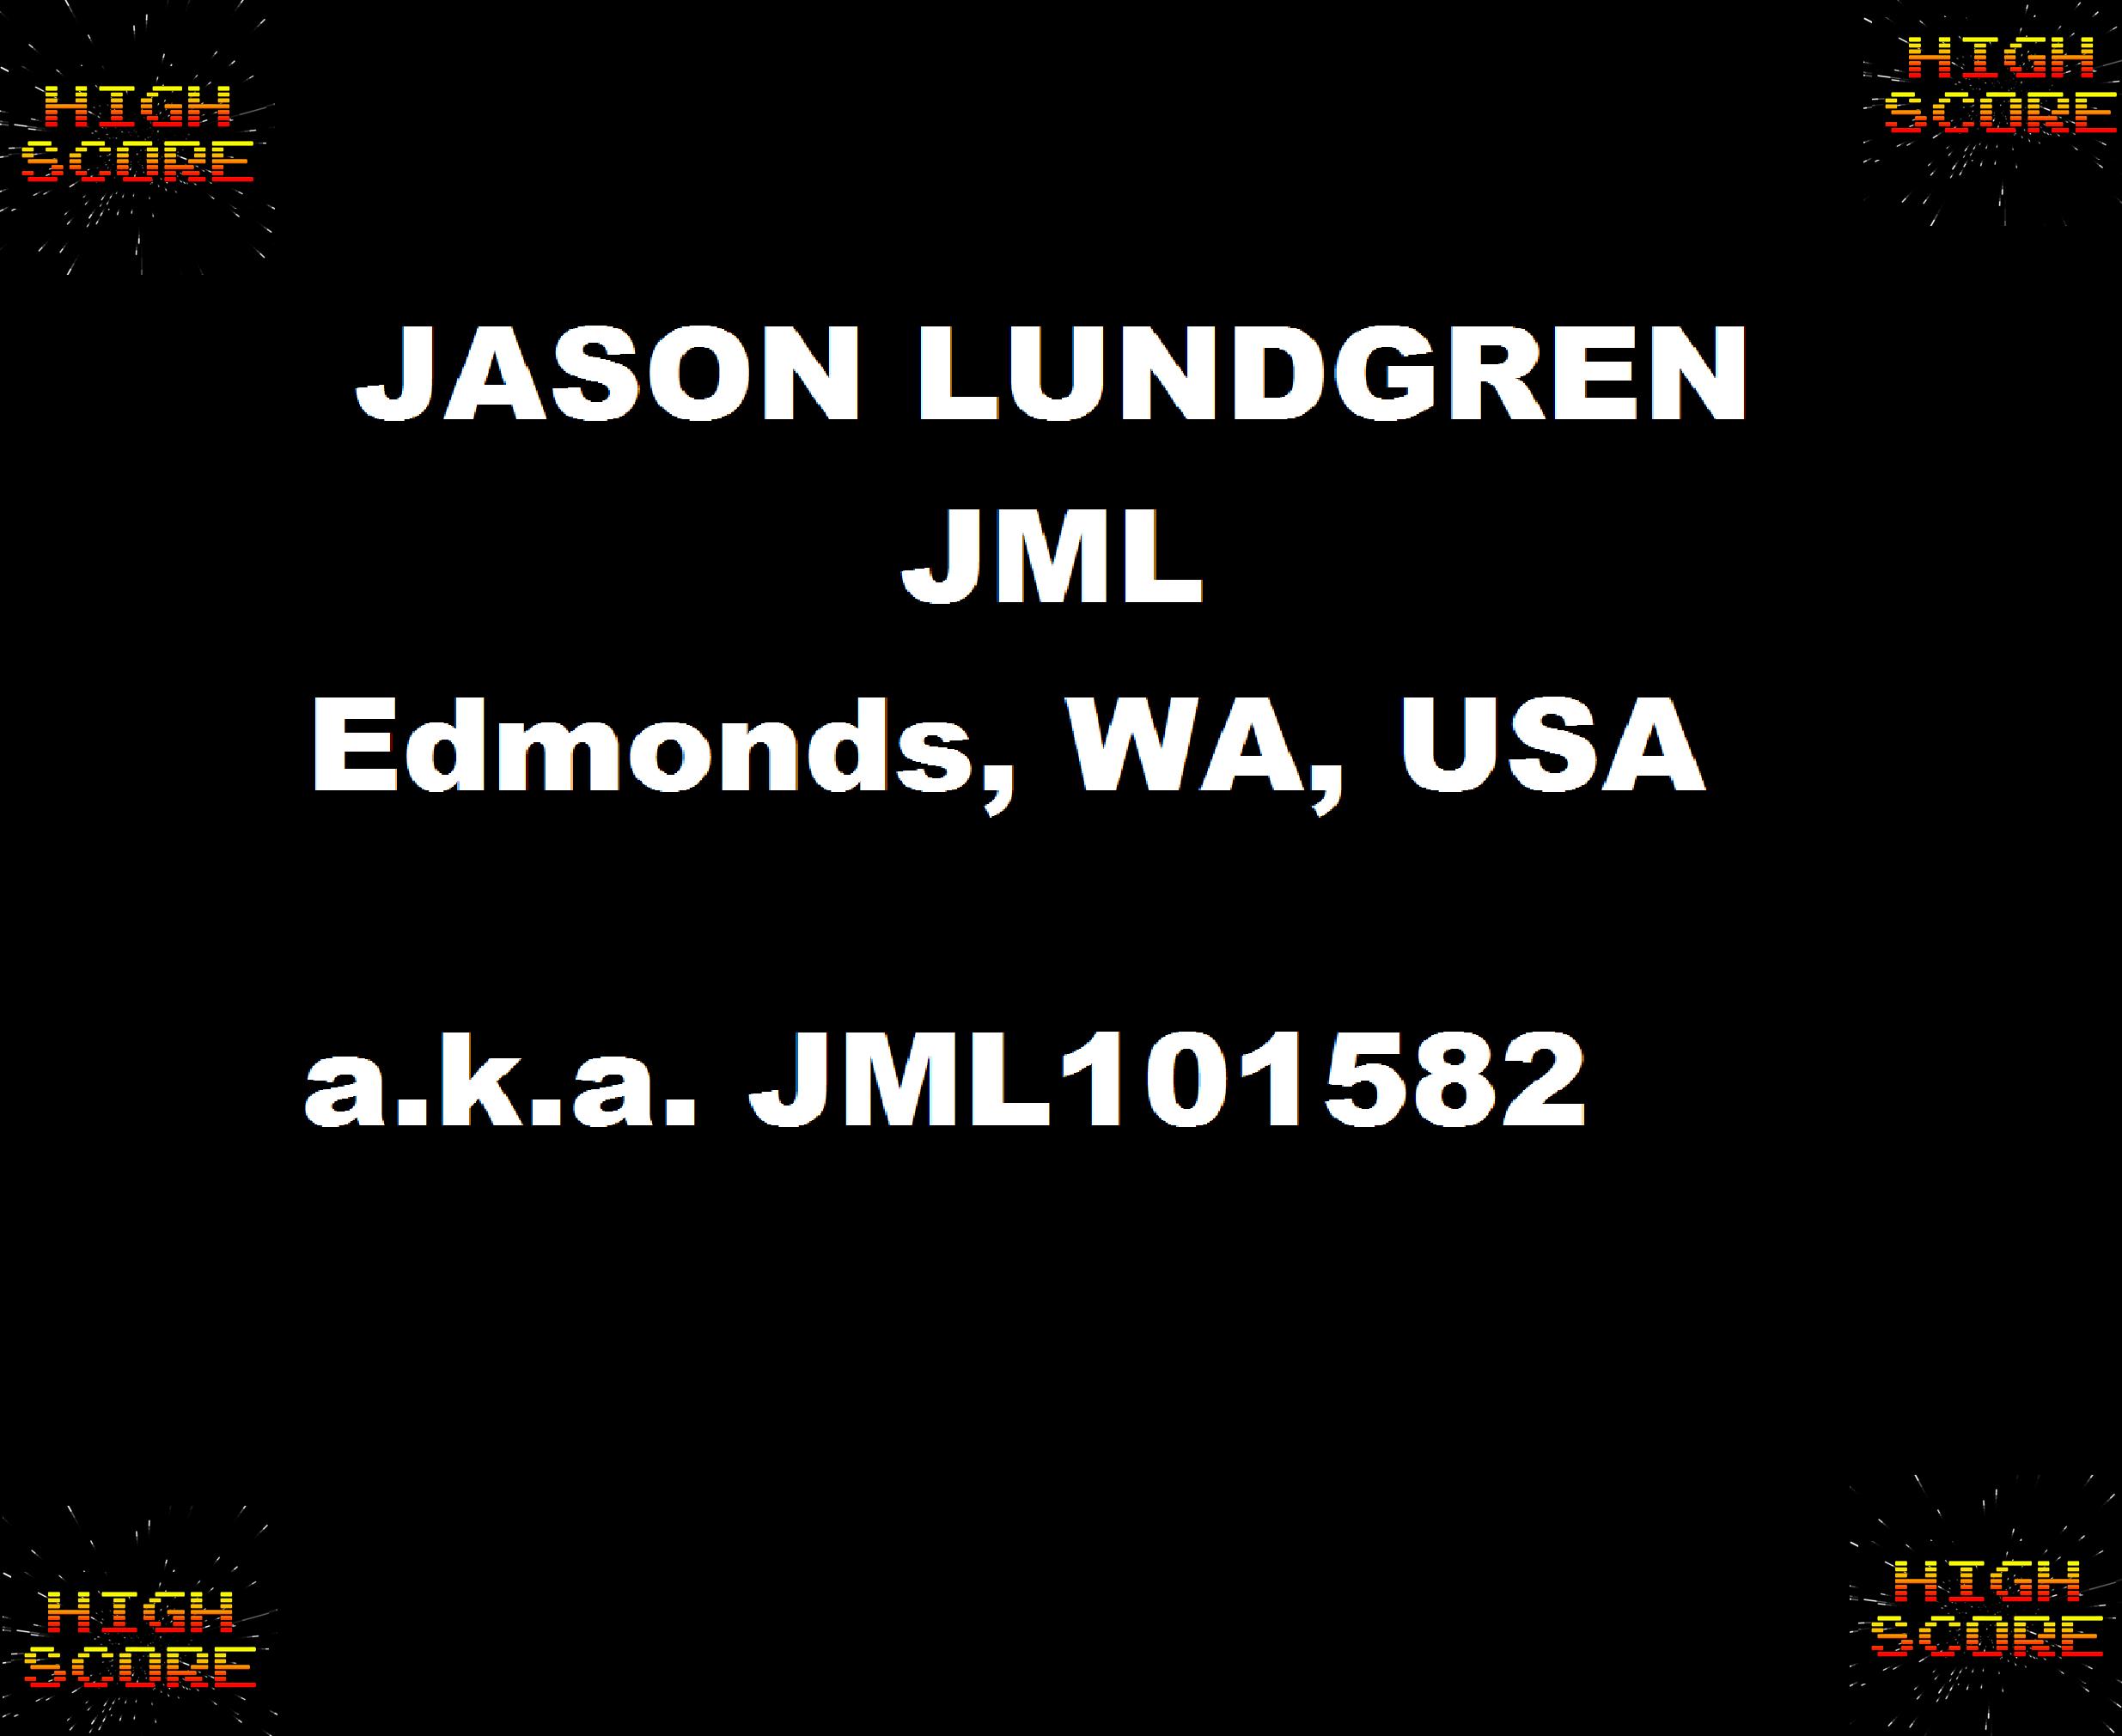 JML101582: G-LOC: Air Battle [Easy] (Sega Genesis / MegaDrive Emulated) 57,900 points on 2019-07-22 14:38:45